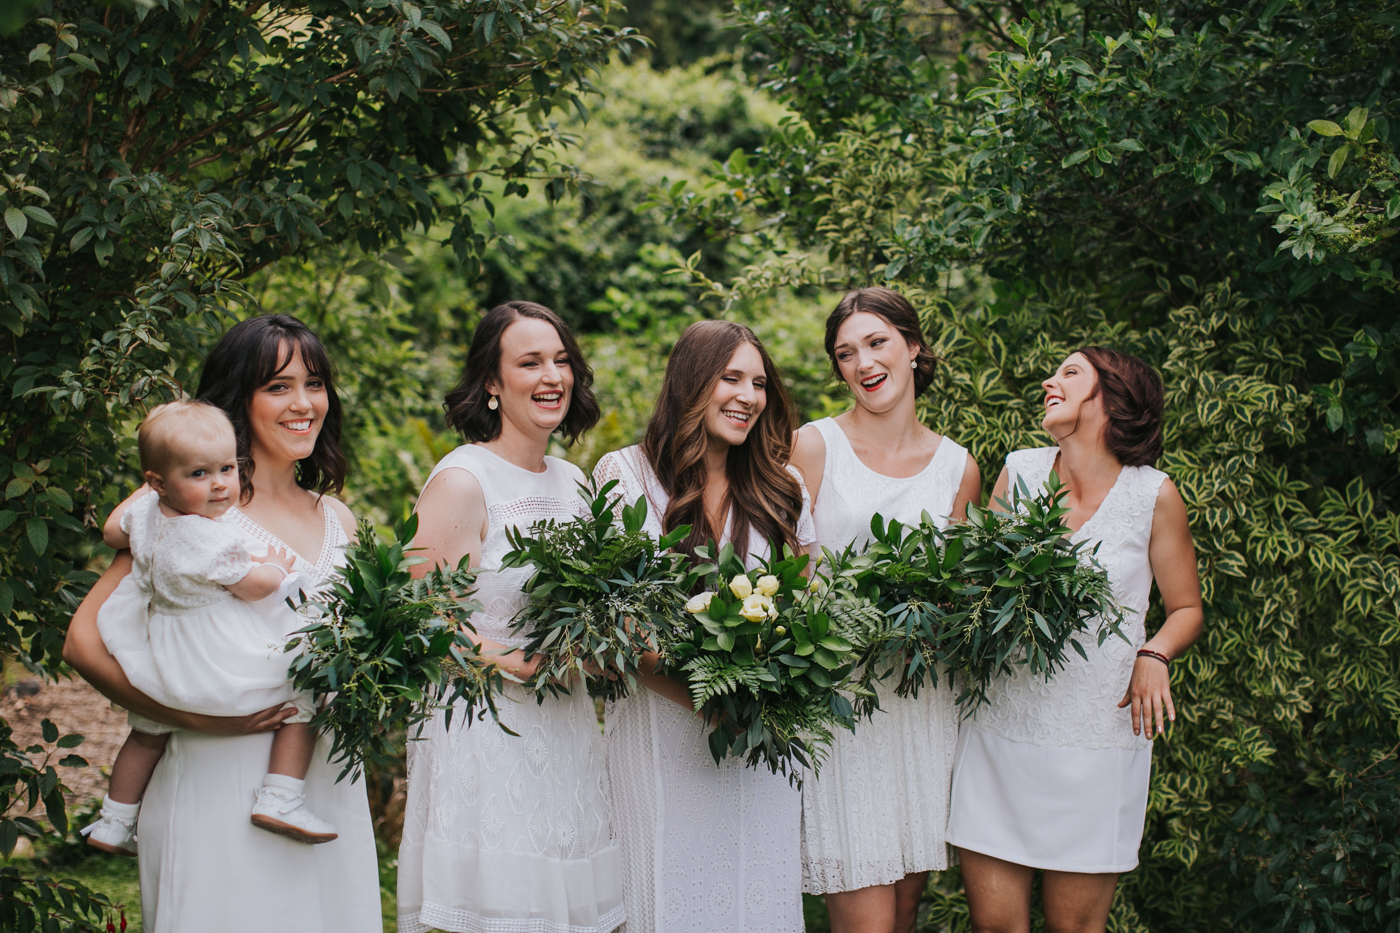 Ariana & Tim - Dunedin, New Zealand Wedding - Destination Wedding - Samantha Heather Photography-57.jpg